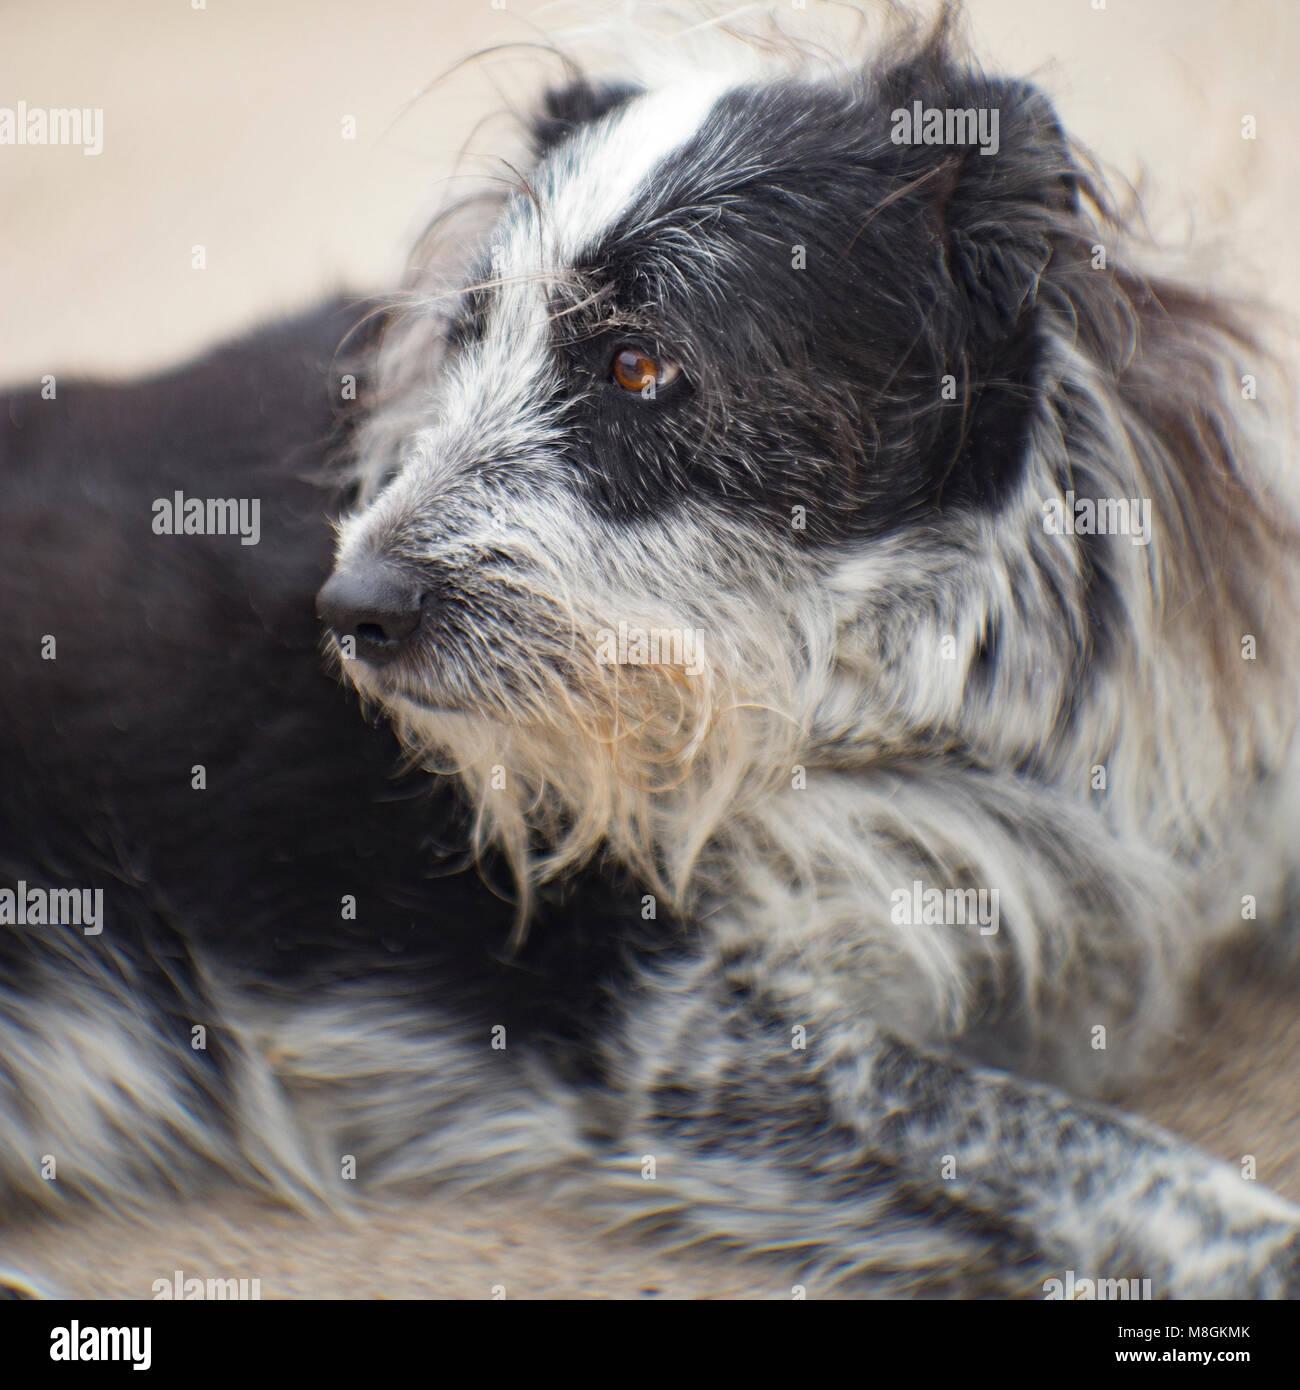 Grey Haired Dog Stock Photos & Grey Haired Dog Stock Images - Alamy